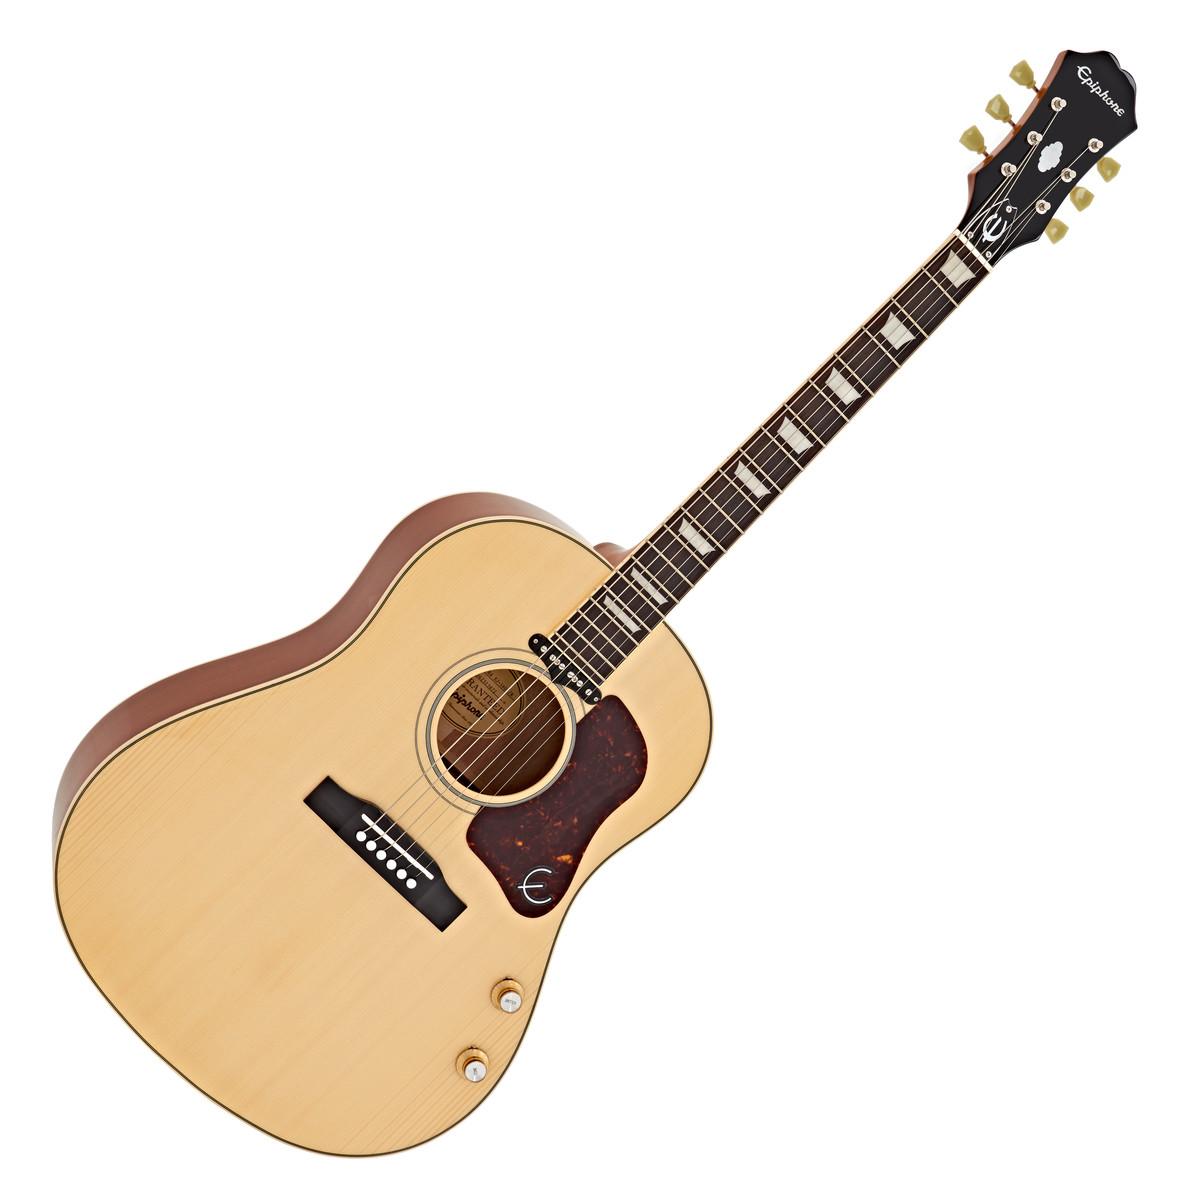 epiphone guitare electro acoustique ltd d ej 160e. Black Bedroom Furniture Sets. Home Design Ideas